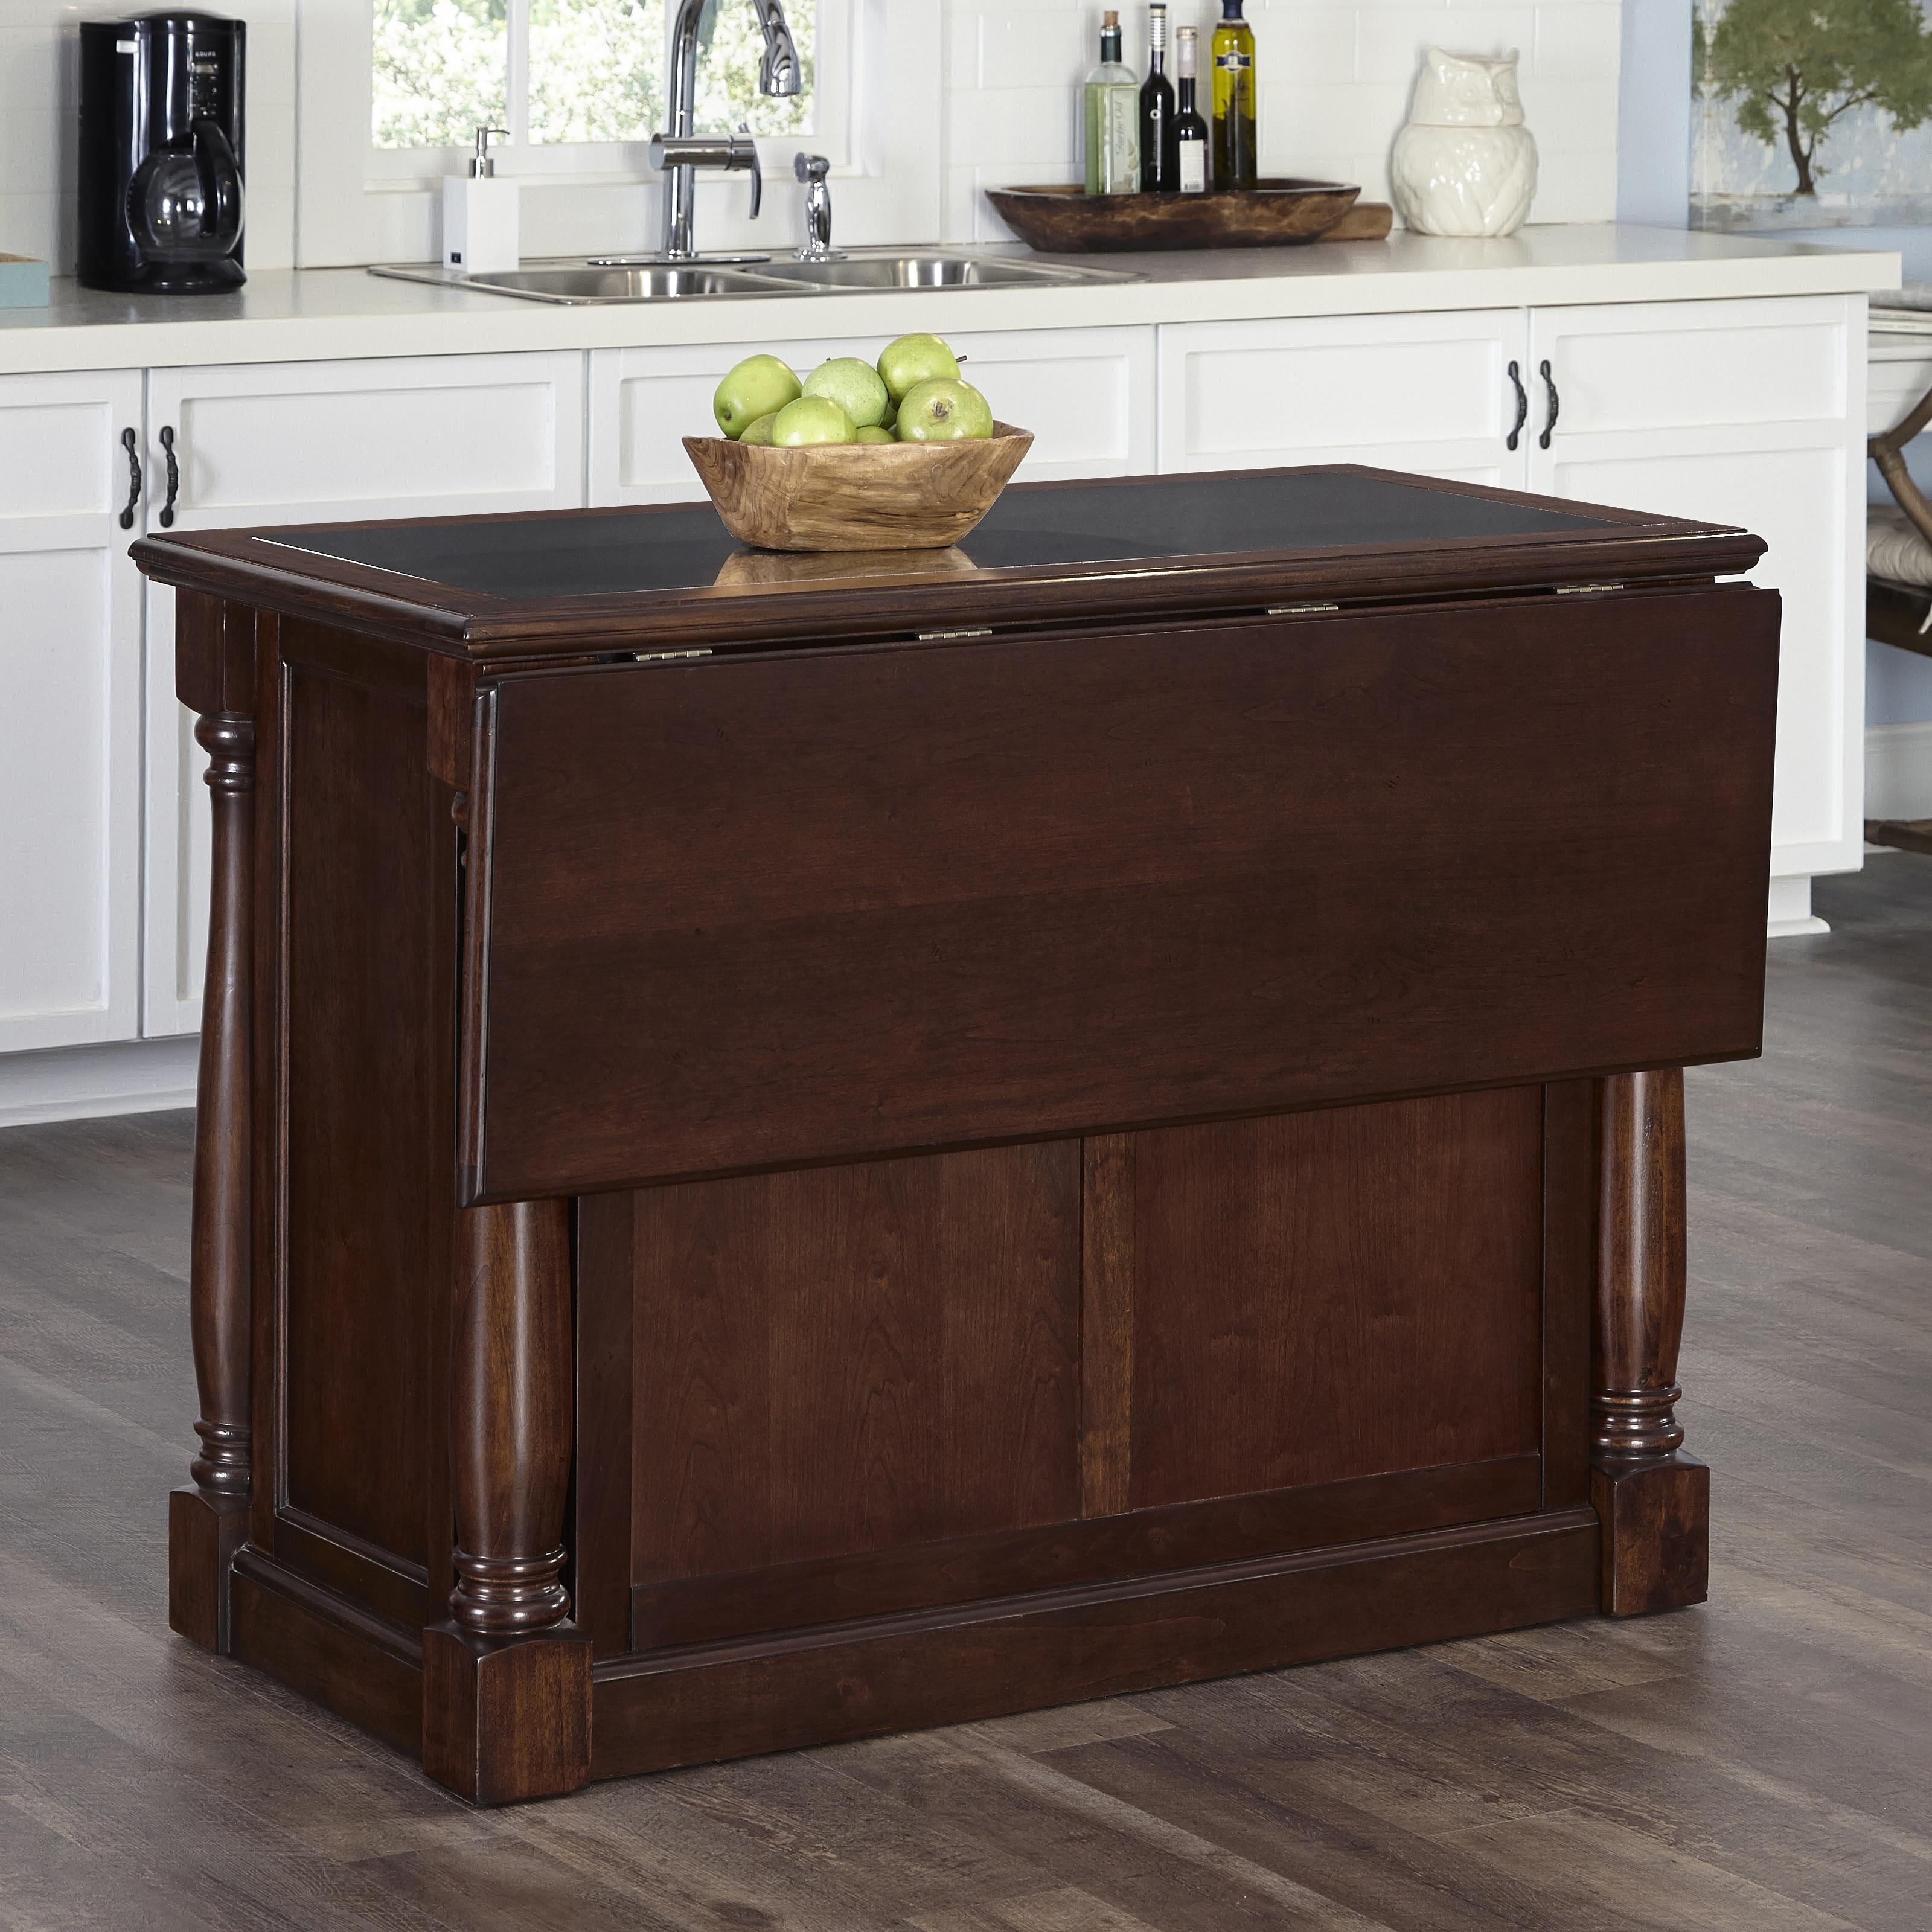 Home Styles Monarch Kitchen Island (Oak w/ Granite Top), ...